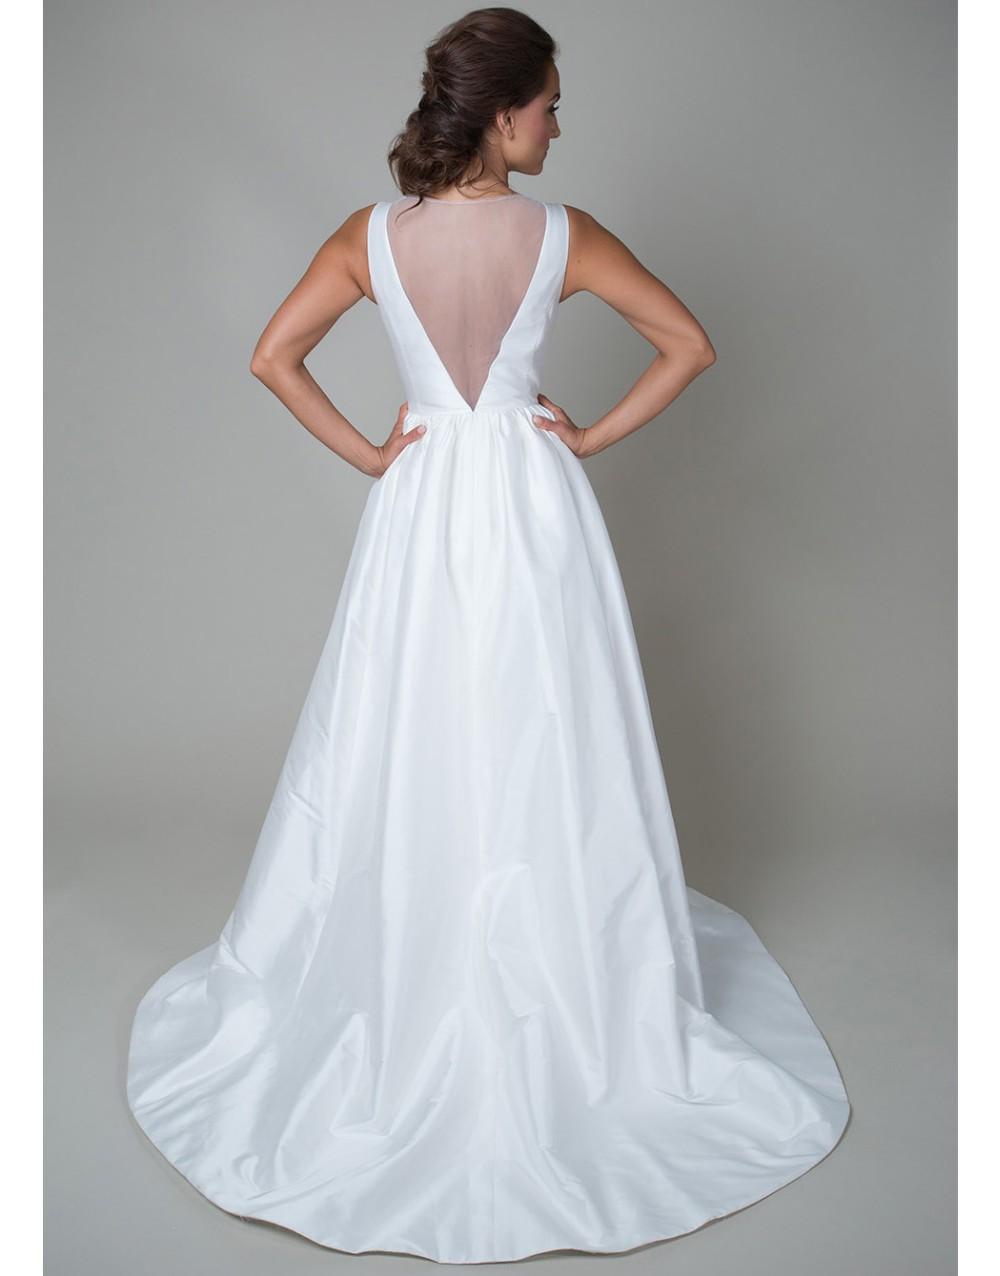 Vintage long white summer boho beach wedding dress with pockets 2015 v neck see through bridal gowns vestidos de noiva UD-442 2